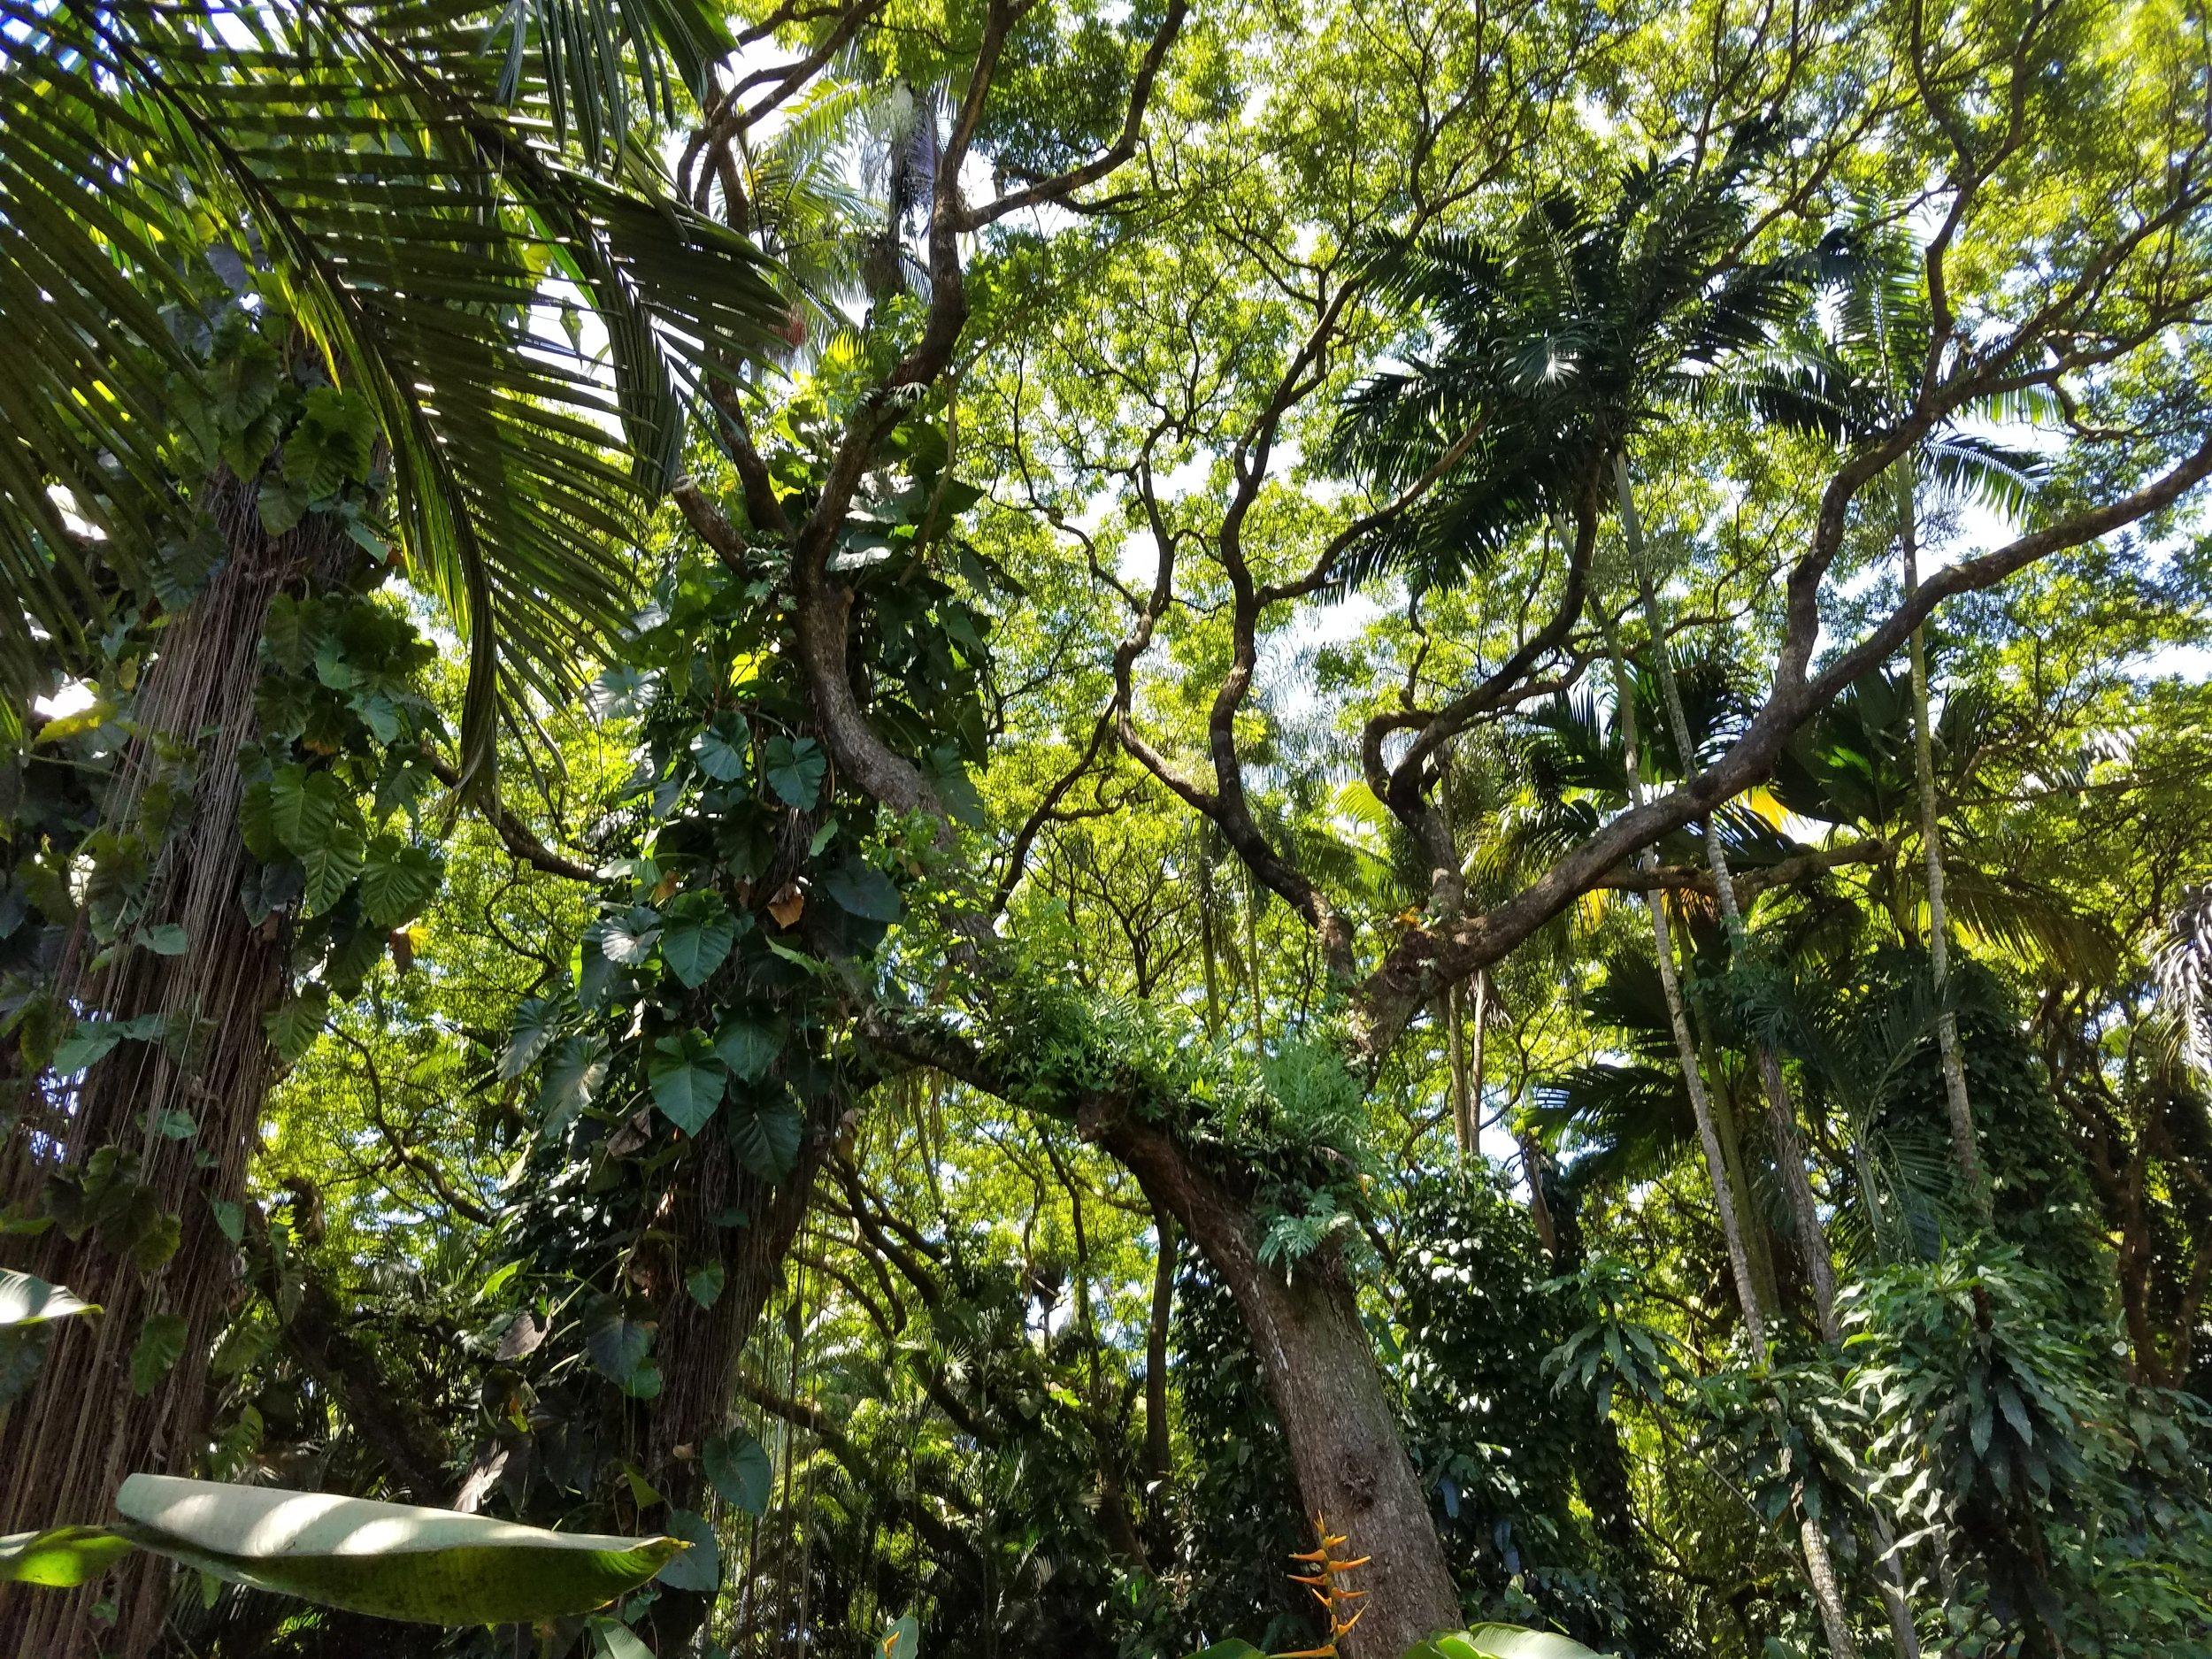 Hawaii Tropical Botanical Garden -